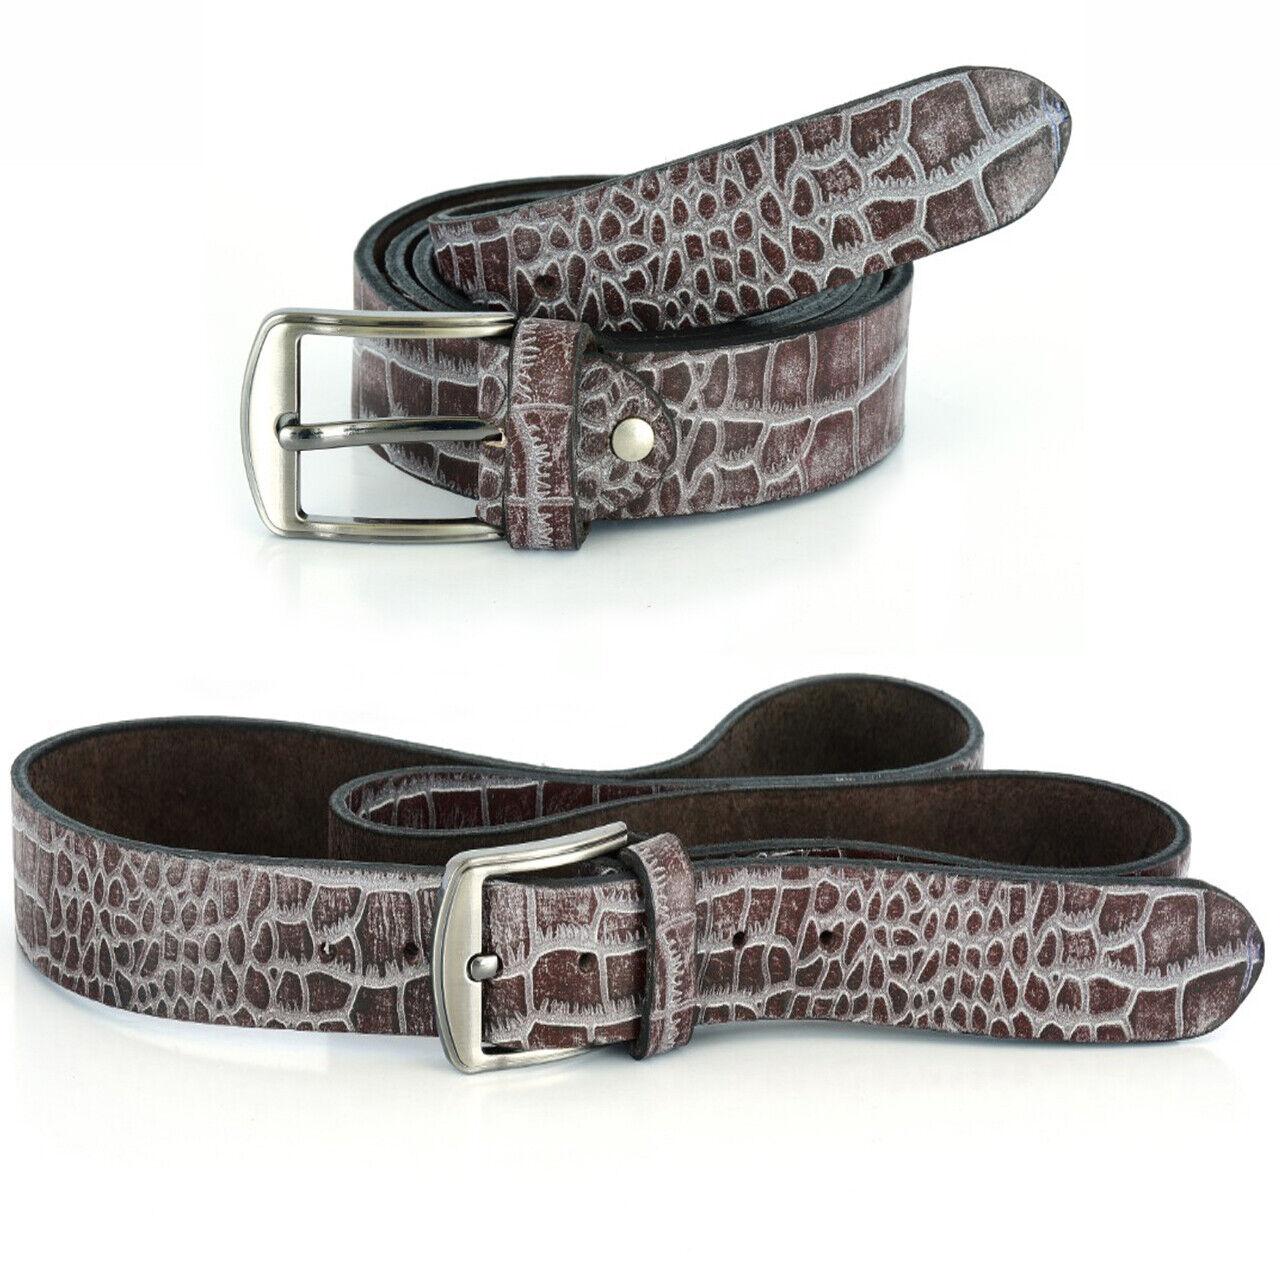 Krokoleder Gürtel Ledergürtel aus Büffelleder Jeansgürtel Bundweite 85-155